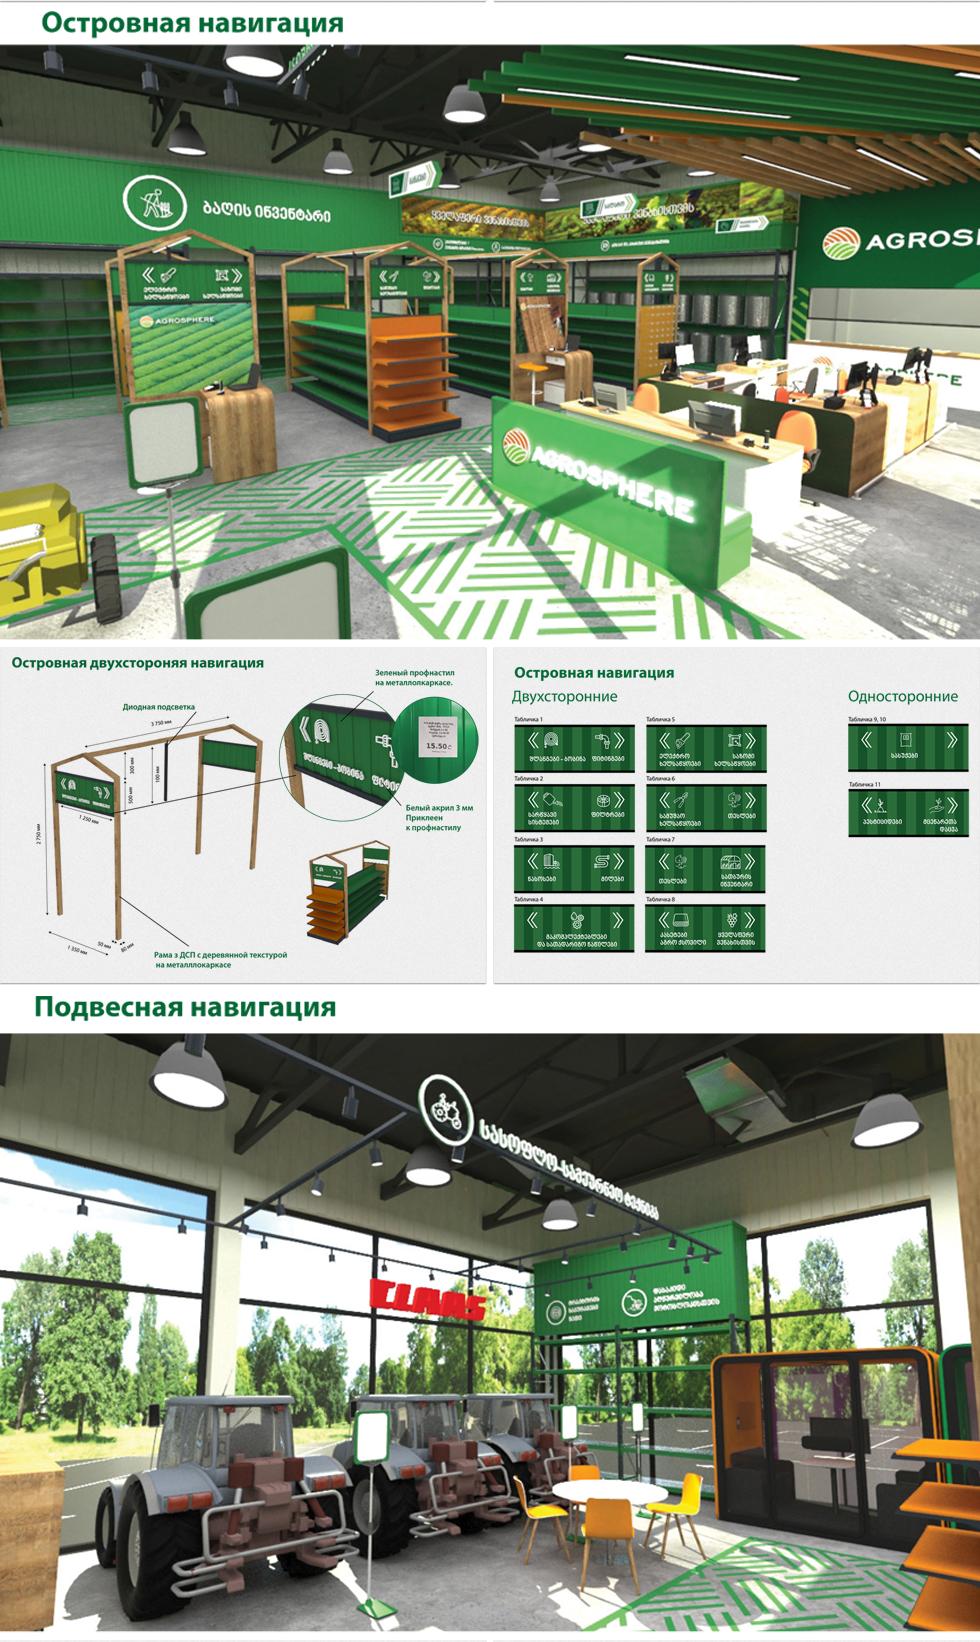 magaziis dizaini da proeqtireba 010.png